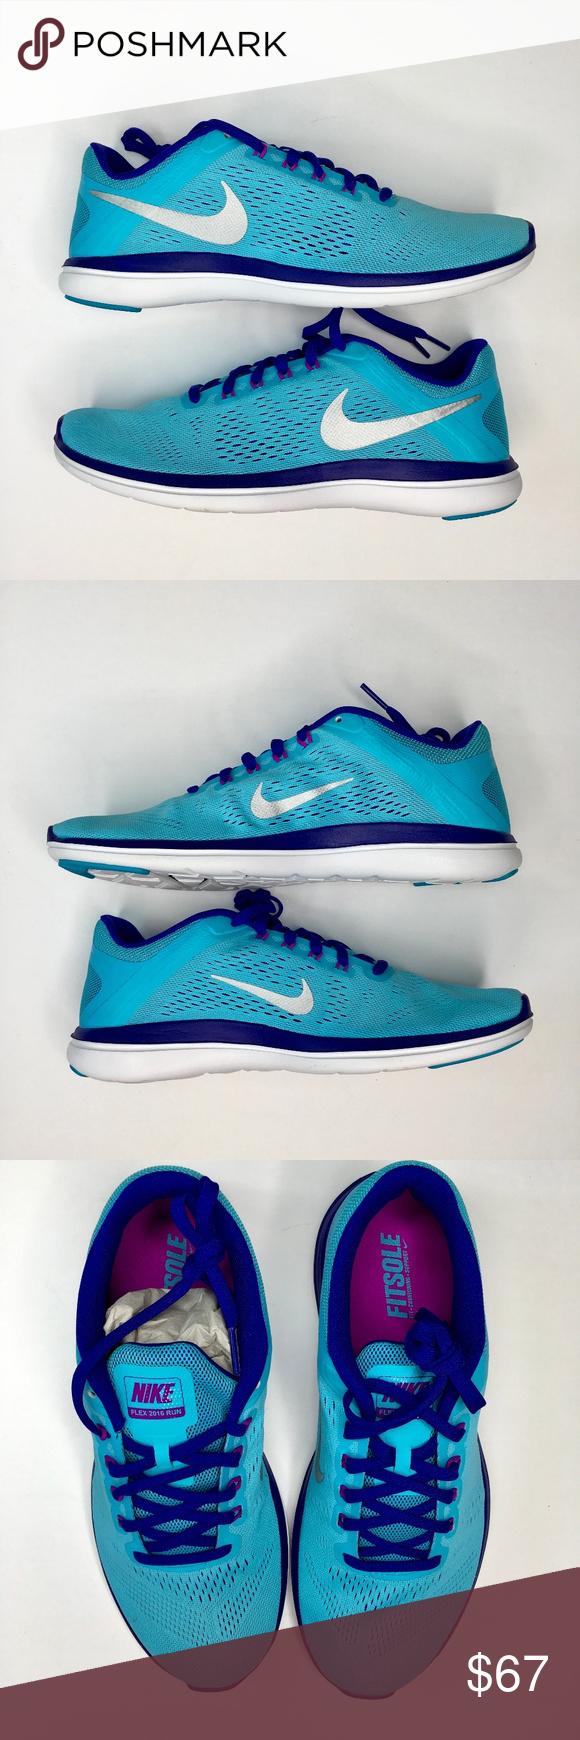 4fd7f6724b7 Nike Flex 2016 RN Blue Purple Running Shoes Nike Flex 2016 RN Women s Size  9 Blue